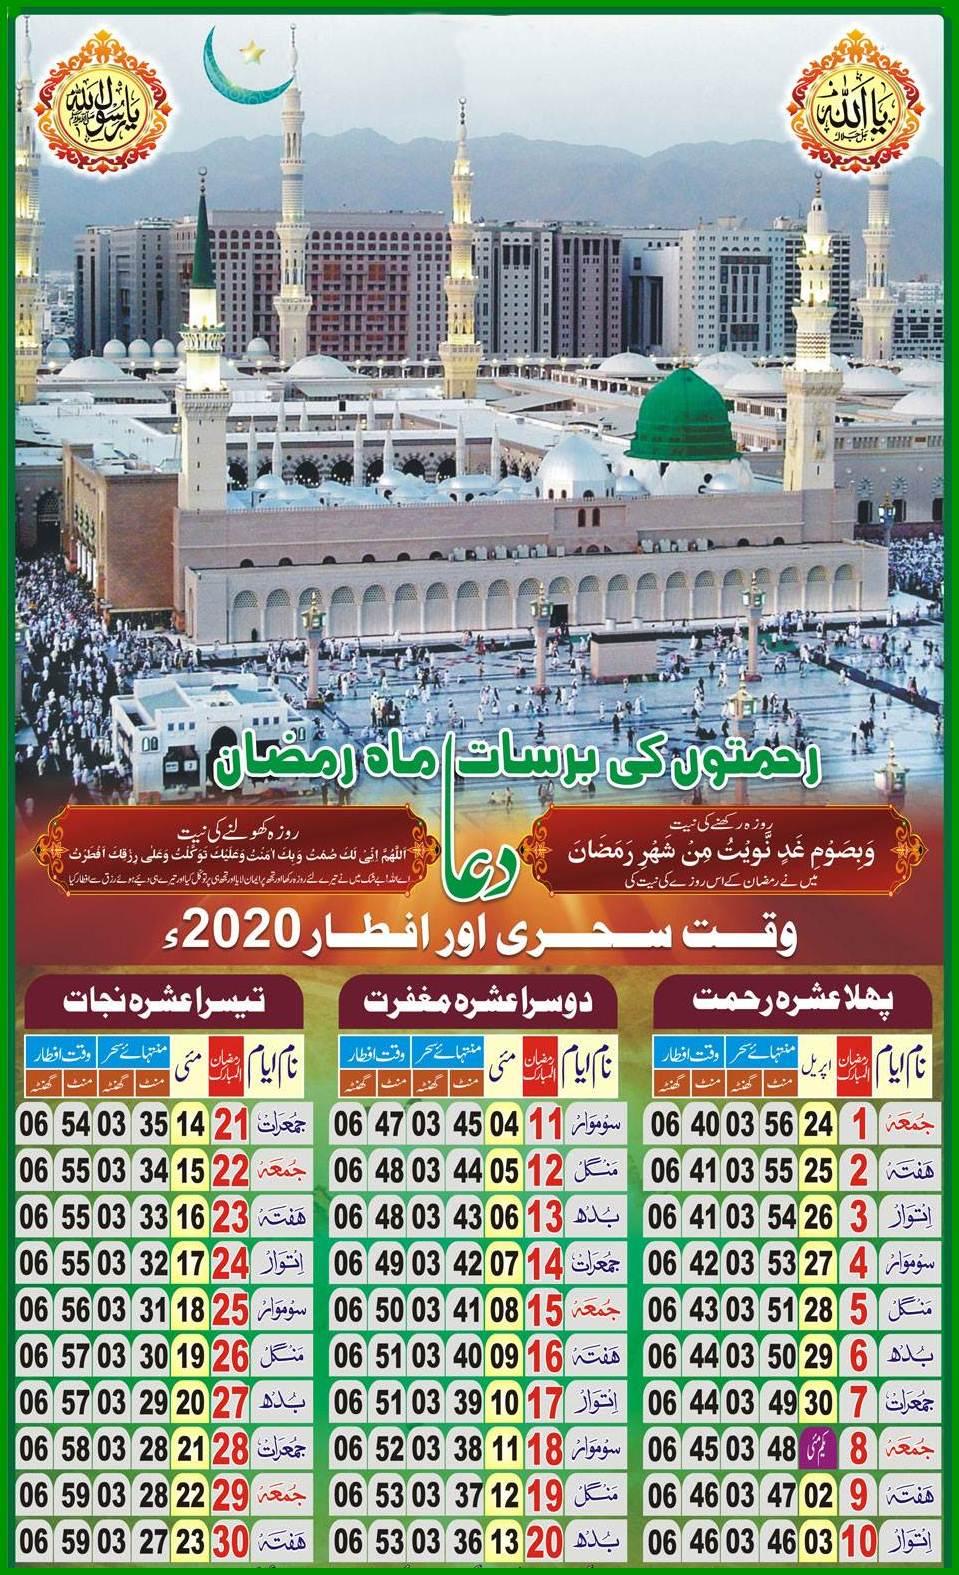 Ramadan Schedule 2020 Pakistan, Ramazan Calendar 1441 Hijri (Shia-Sunni)